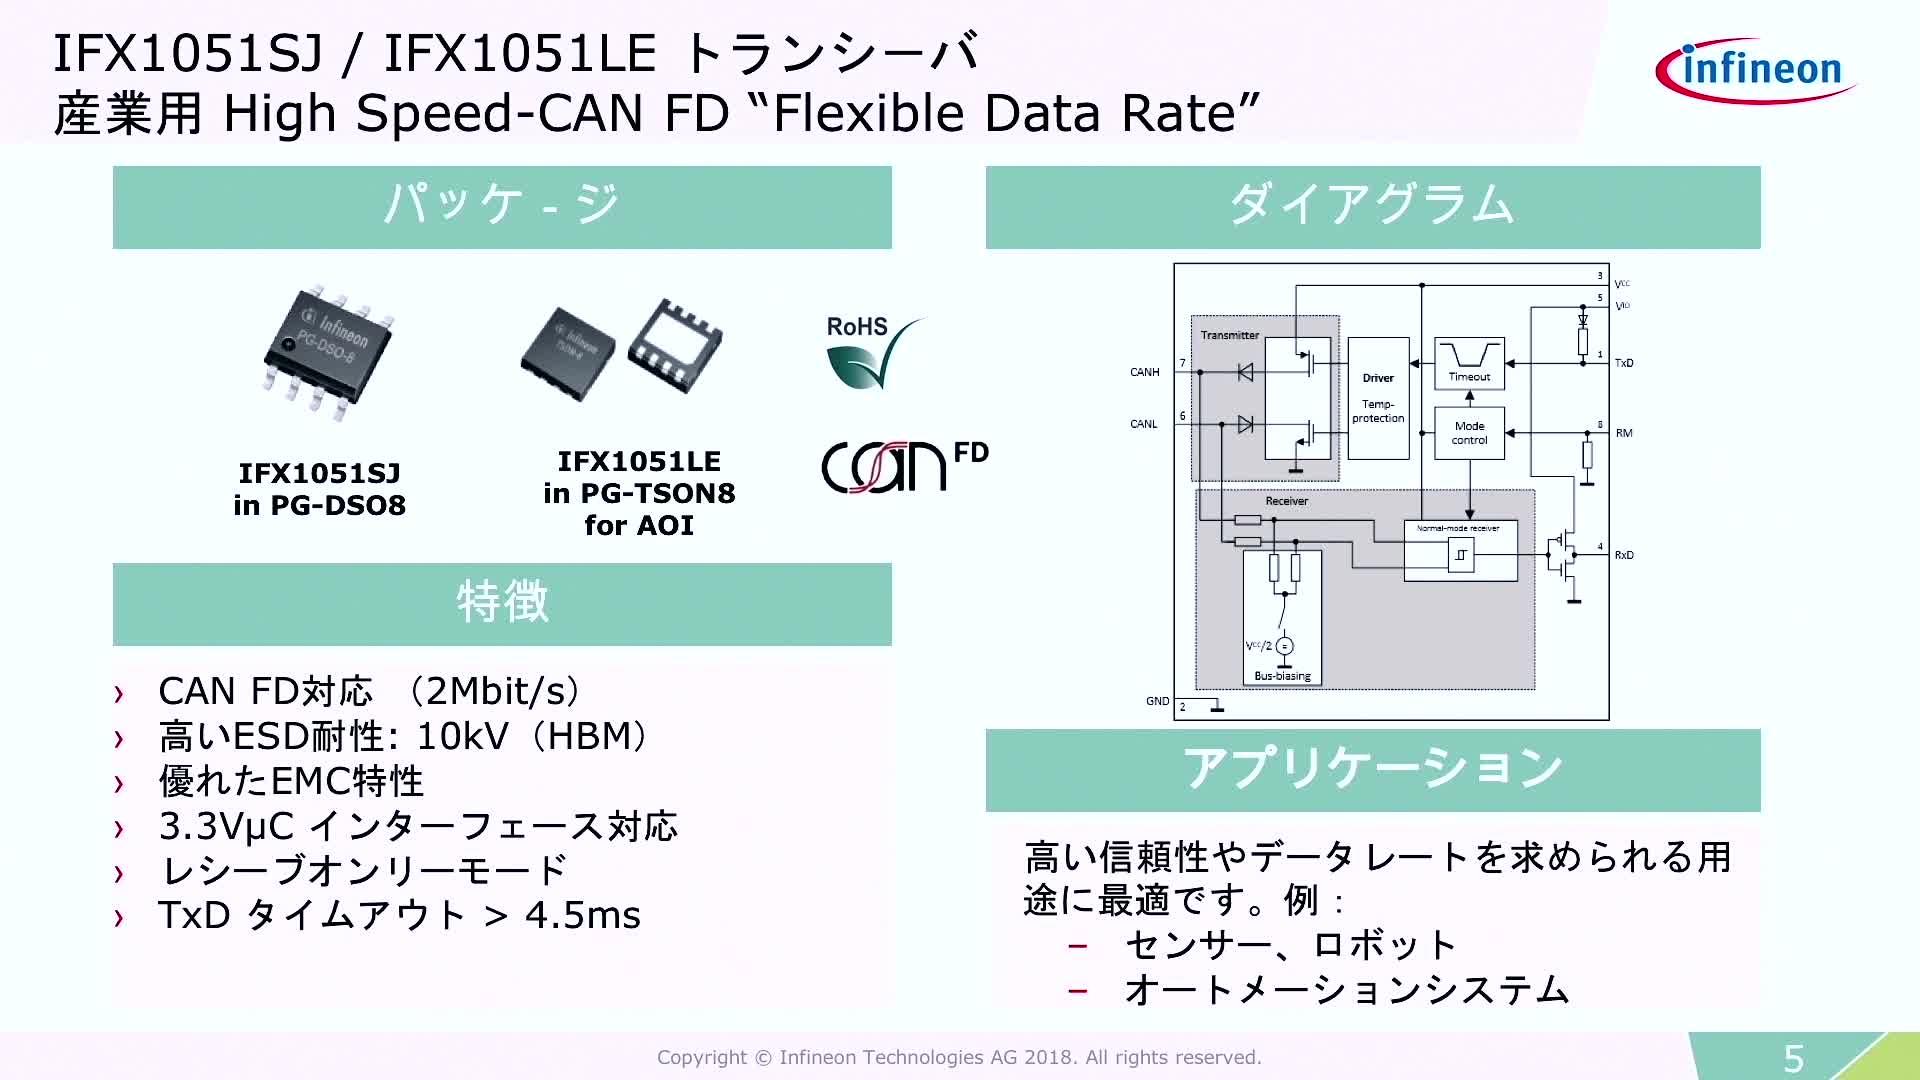 CAN FD(Flexible Data Rate)トランシーバ - 産業用アプリケーション